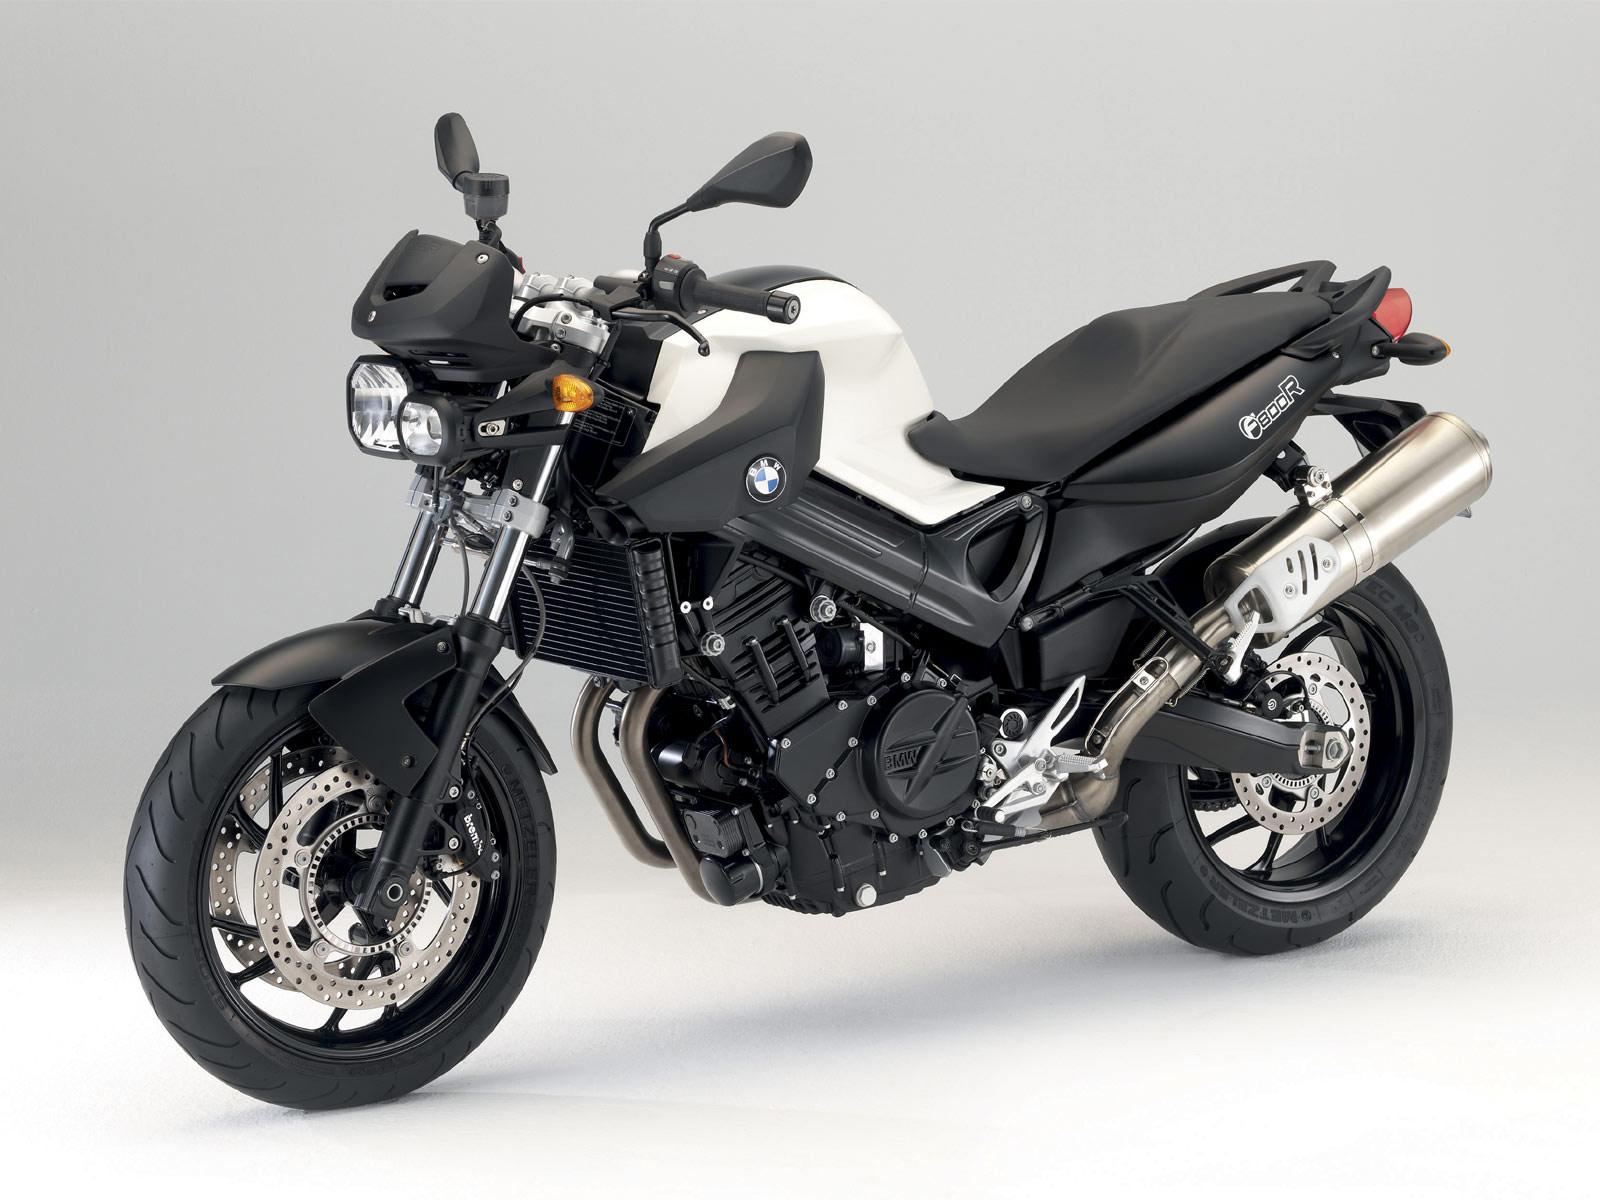 2008 BMW F 800 R Motorcycle Desktop Wallpapers, Insurance